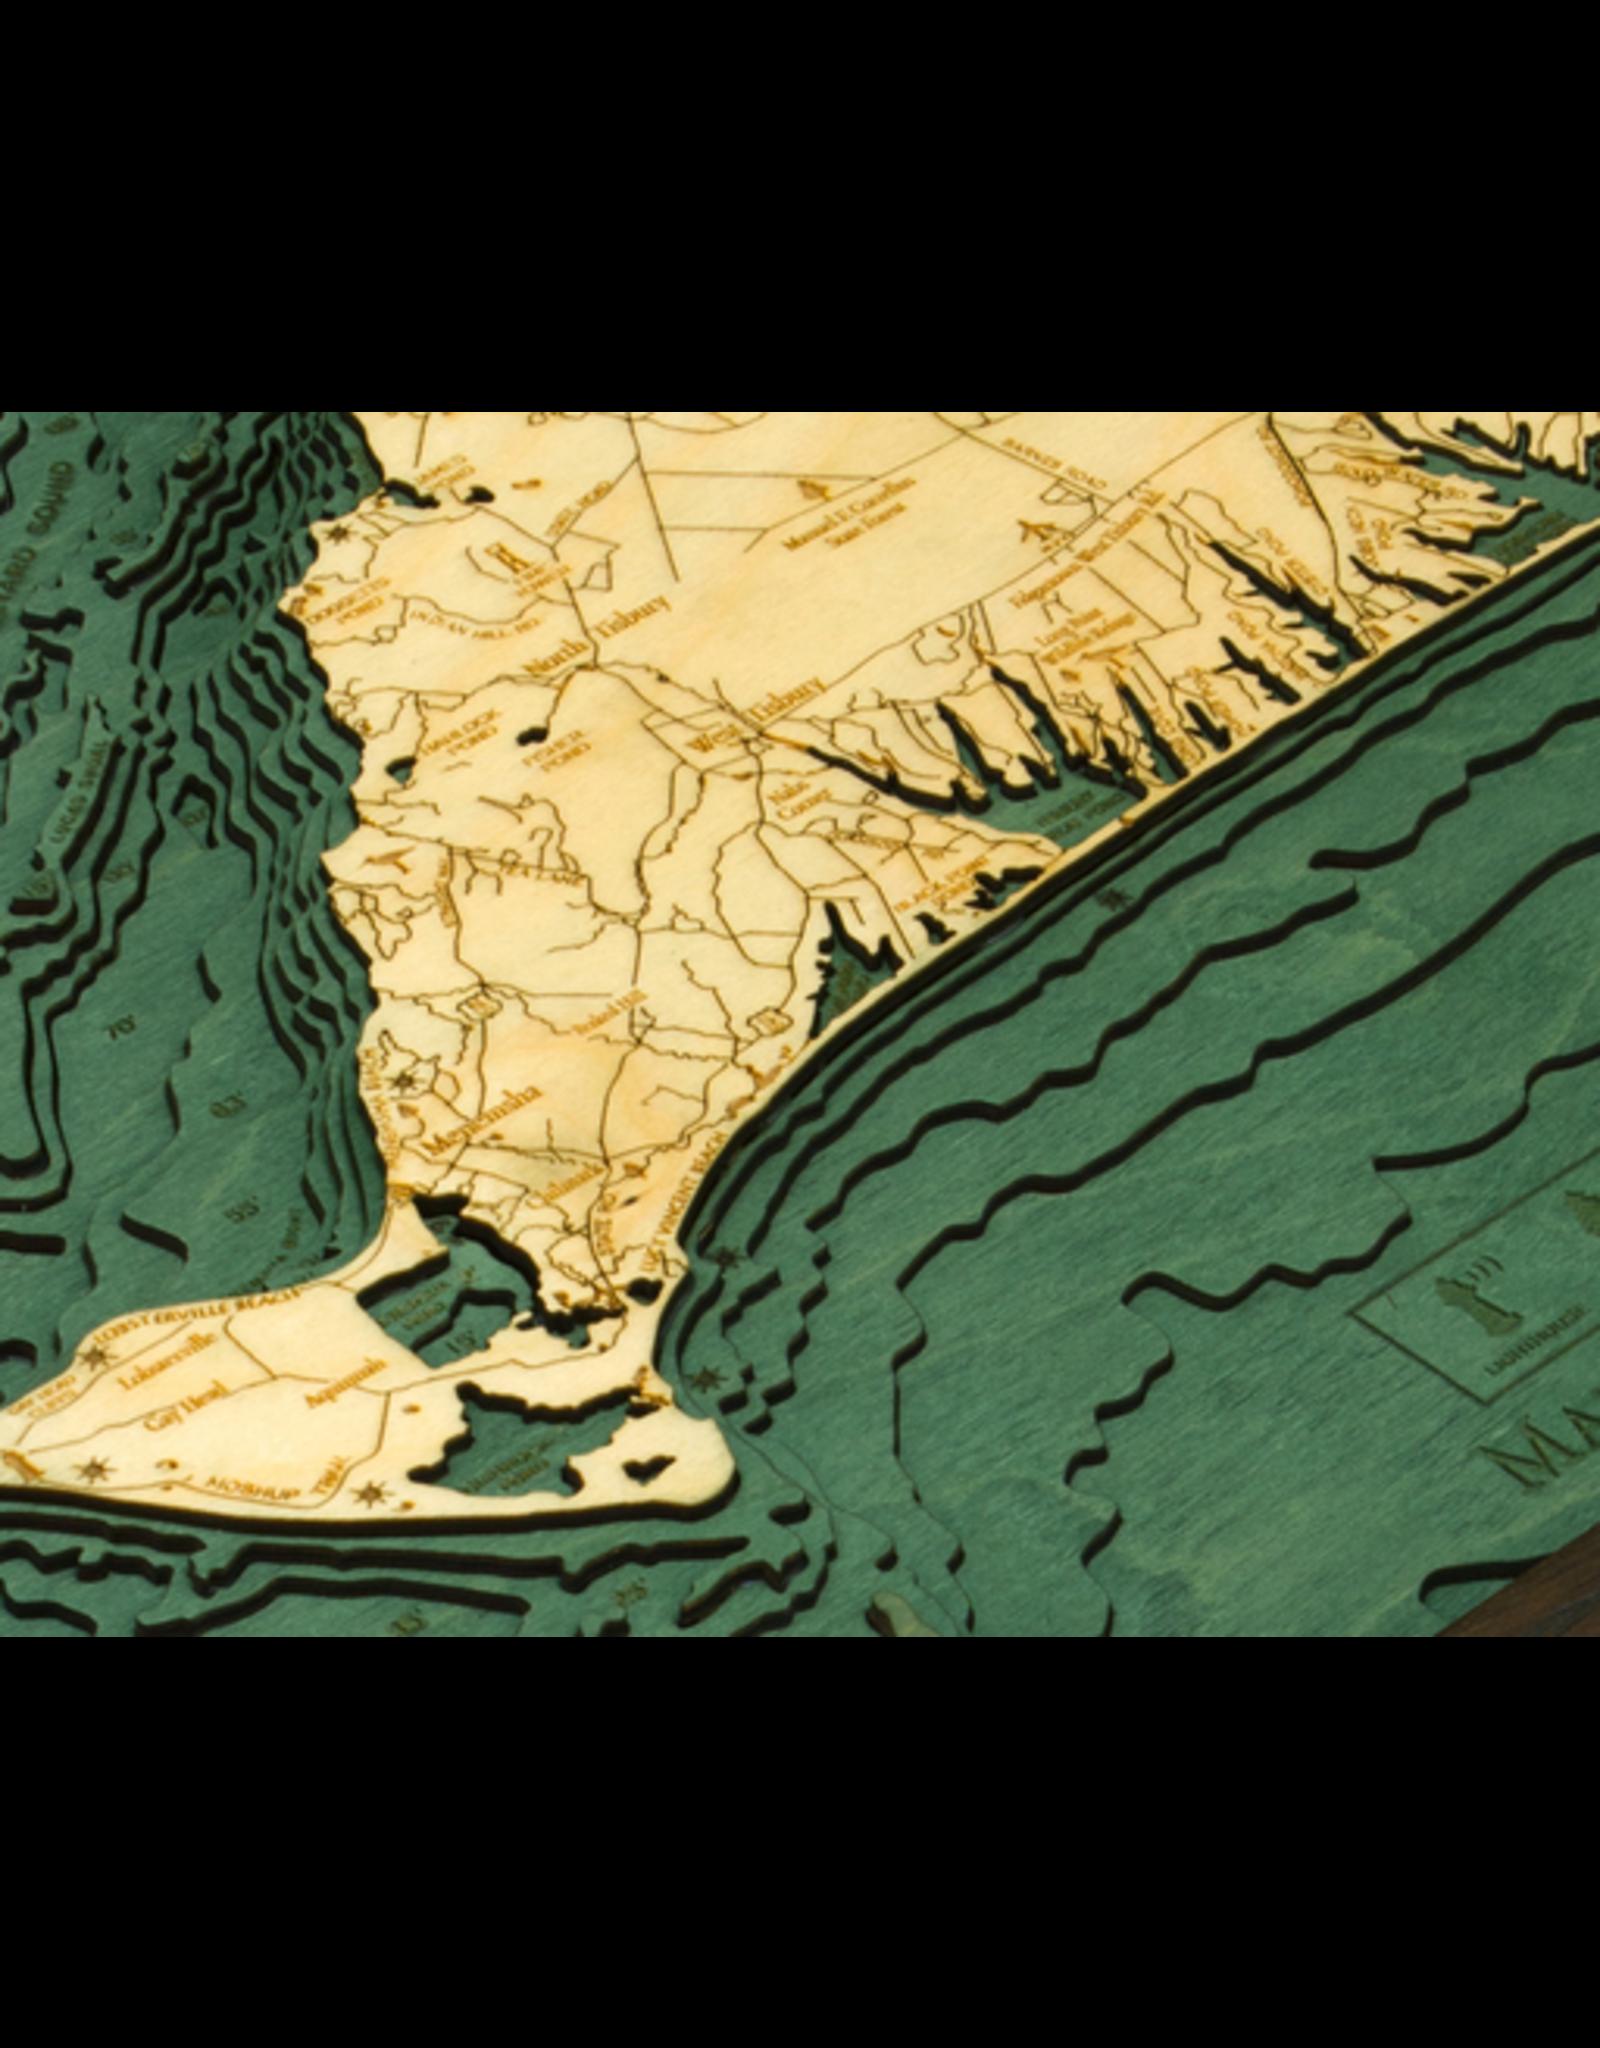 WoodCharts Martha's Vineyard (Bathymetric 3-D Nautical WOODCHART)